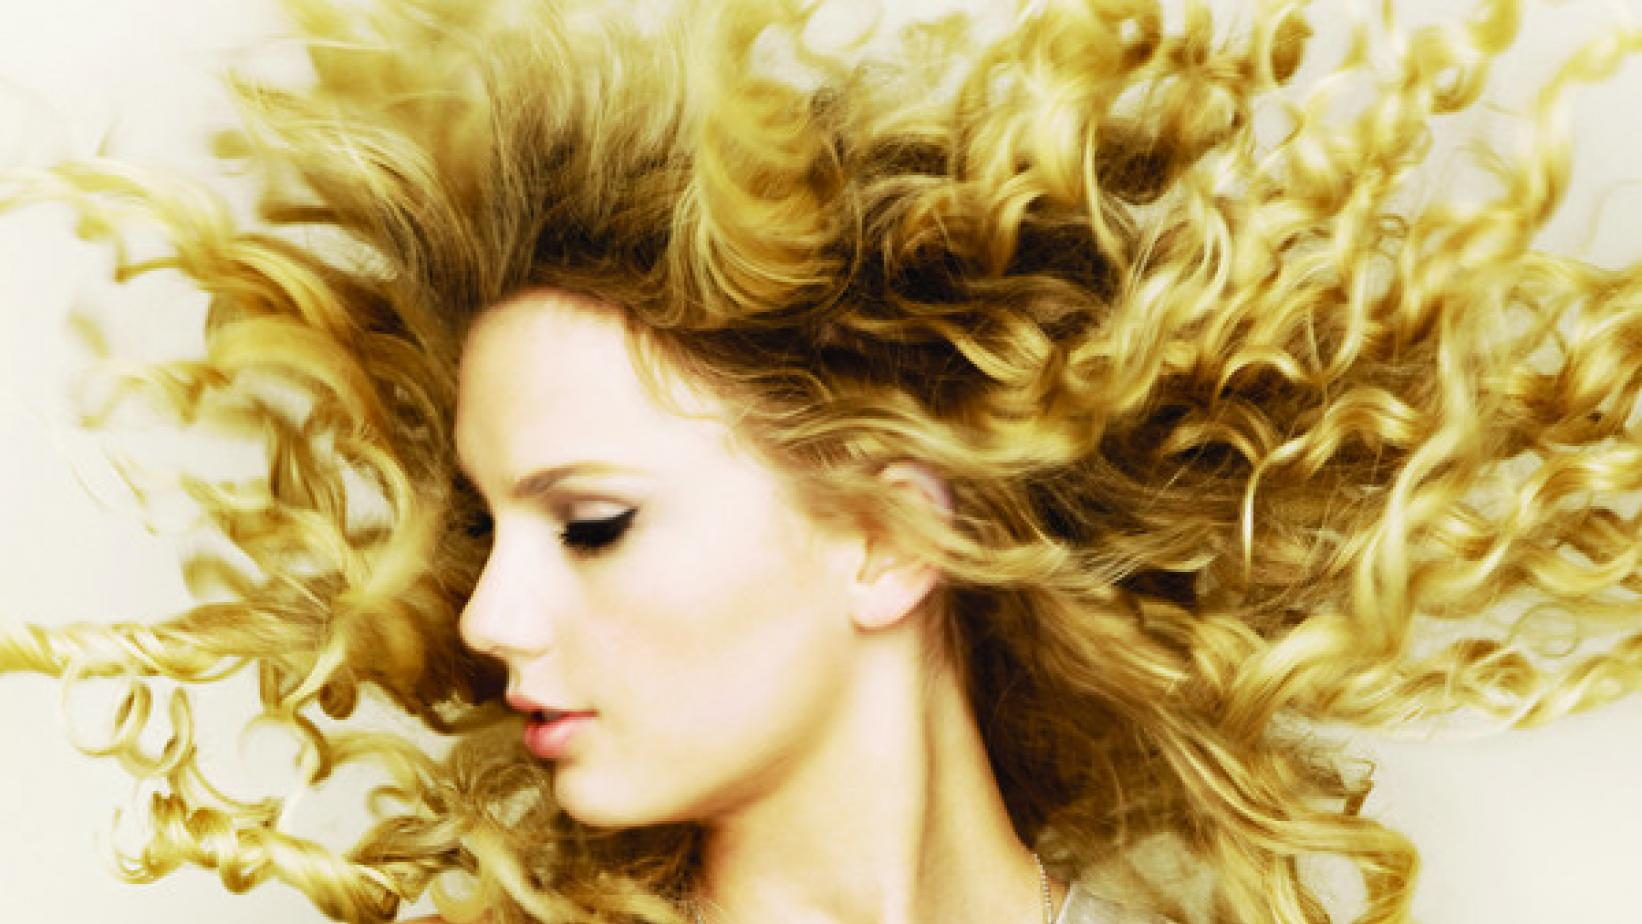 2010 Grammy Awards: Winner Predictions